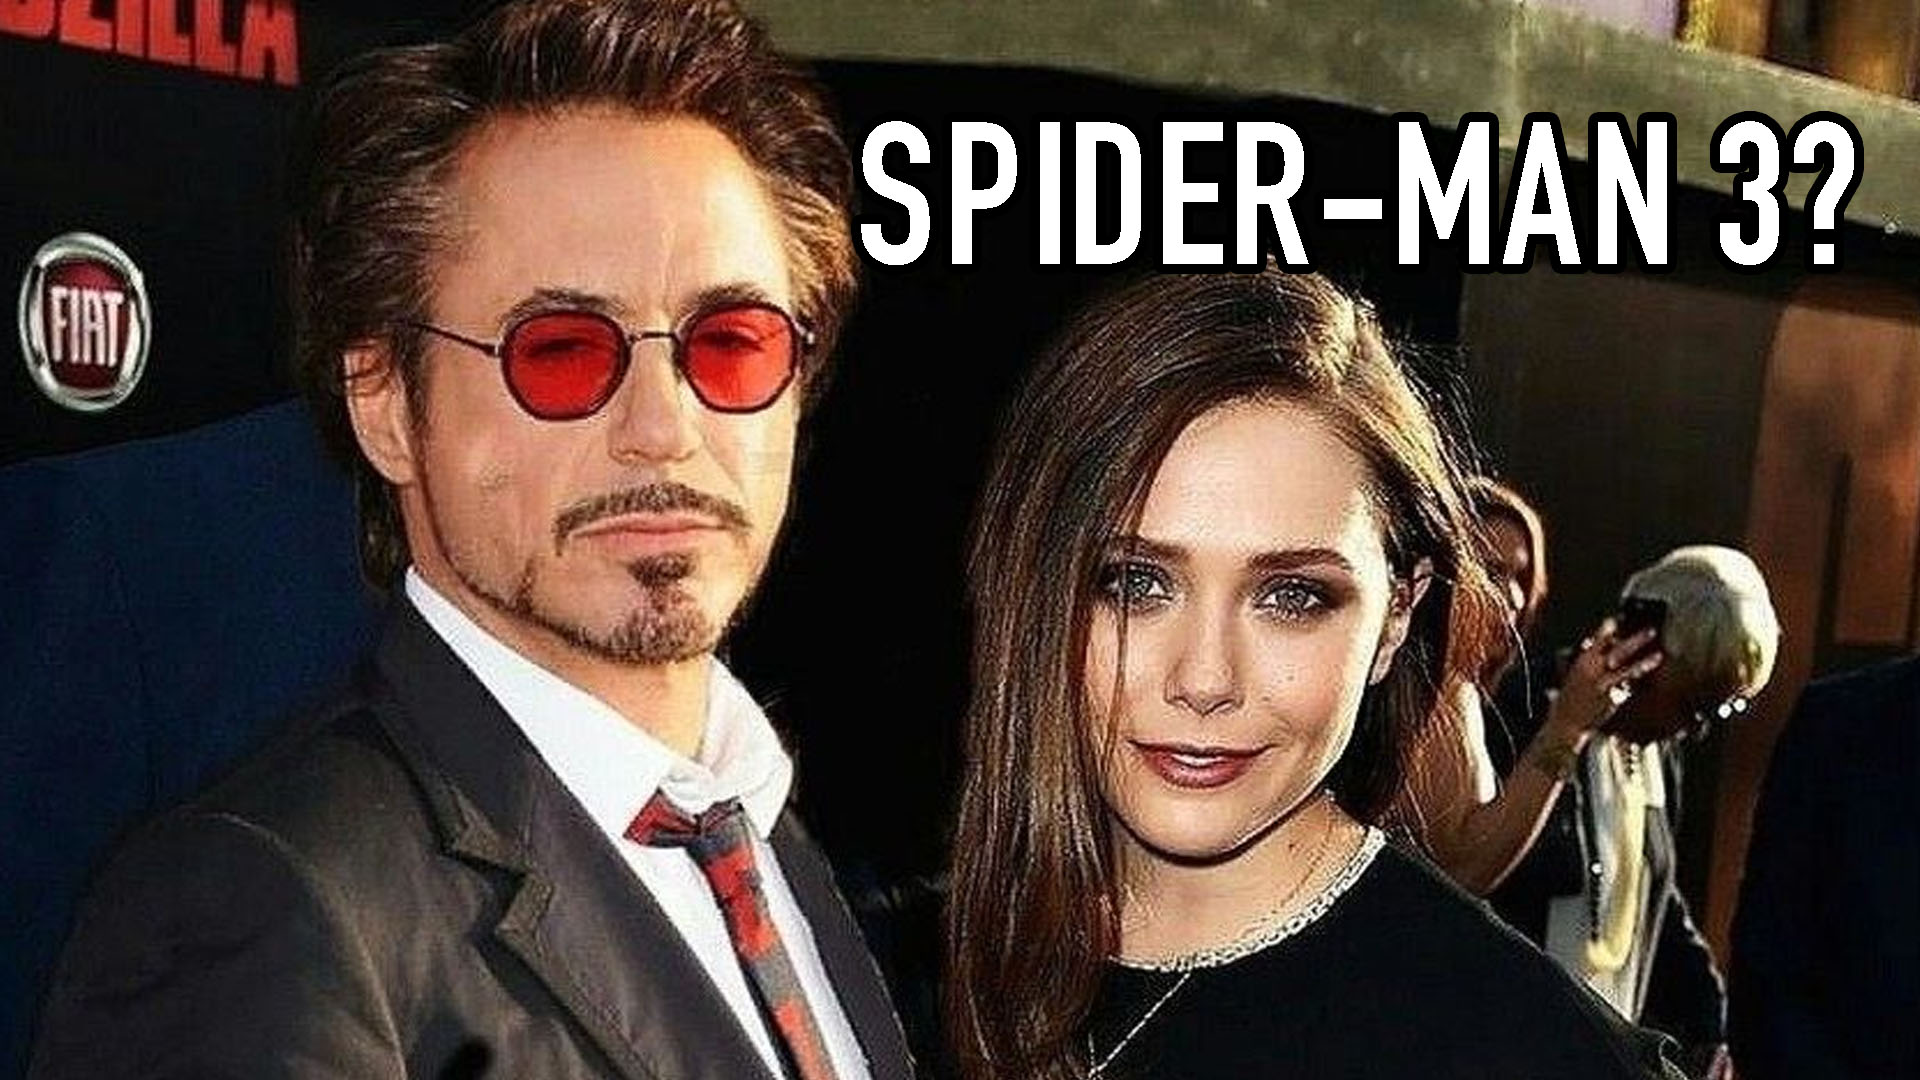 spiderman 3 cast updates